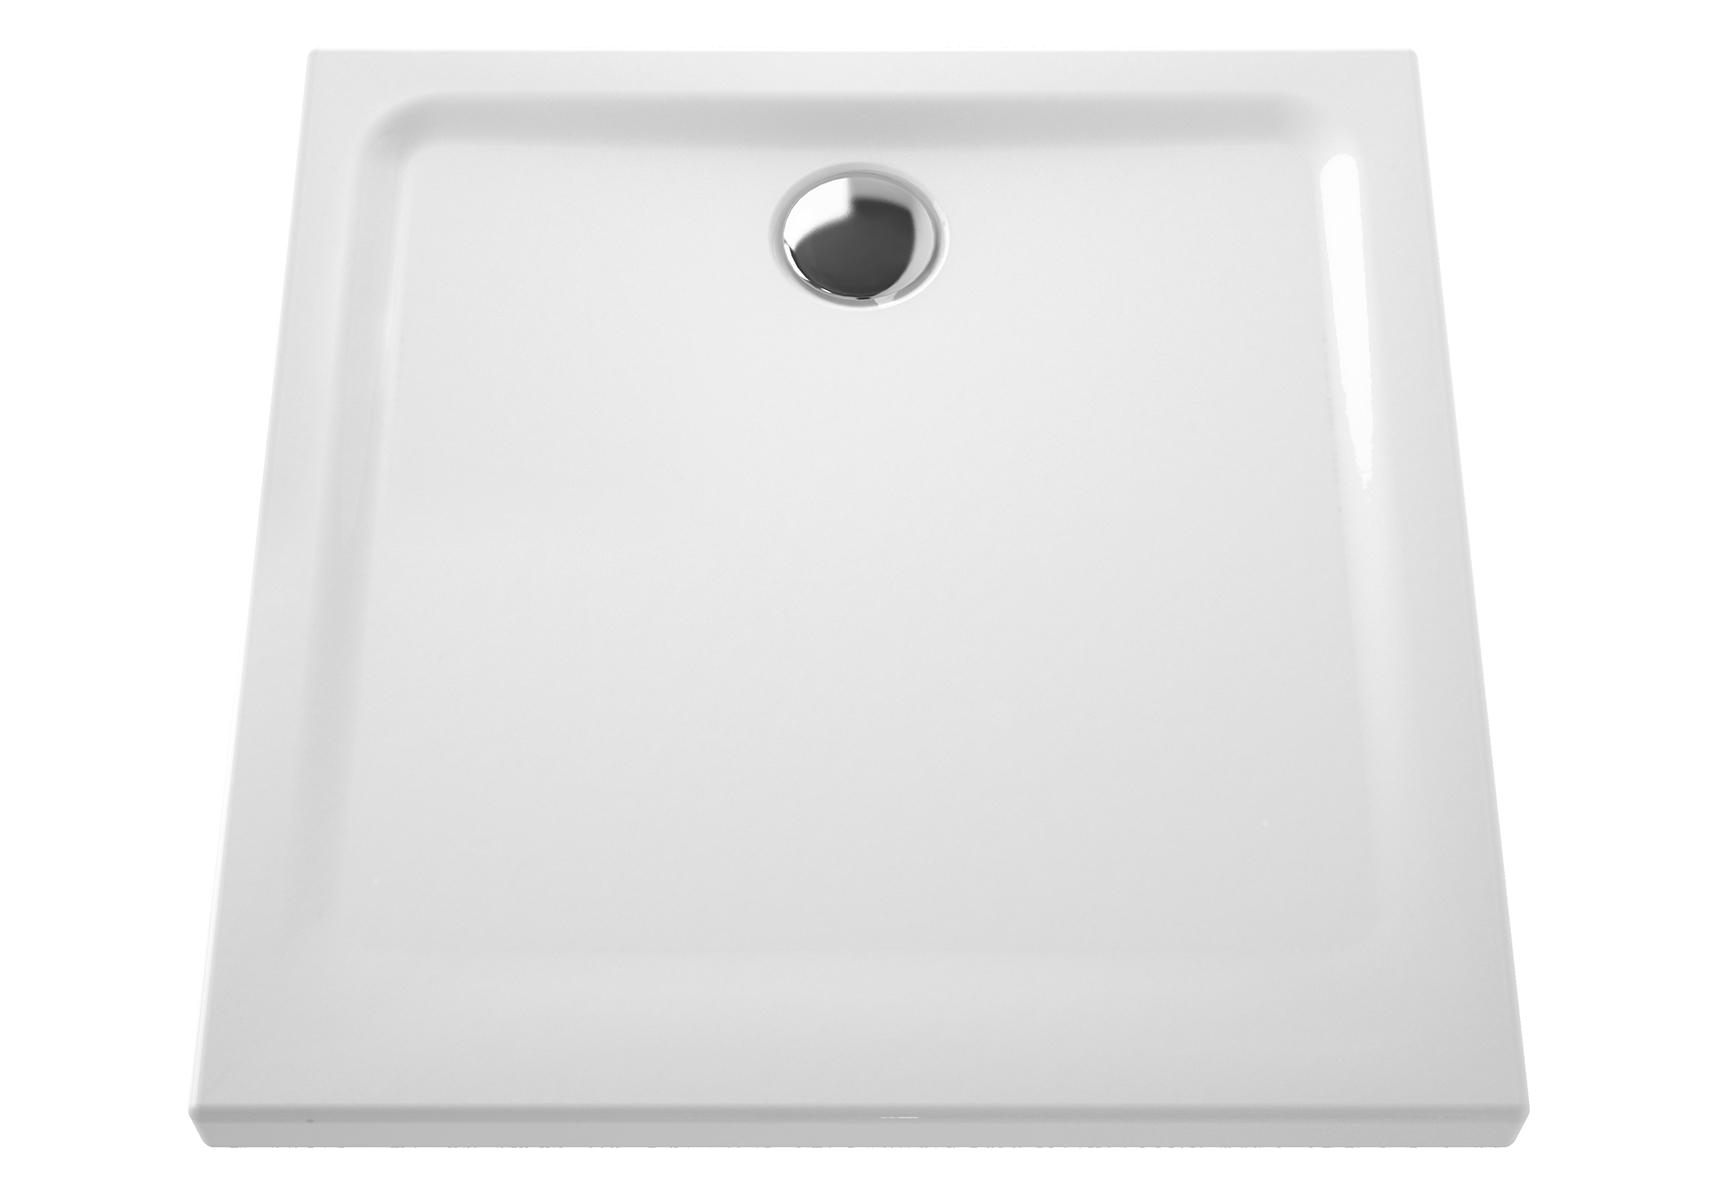 Arkitekt receveur à encastrer ou à poser extra plat, 80  x  80 cm